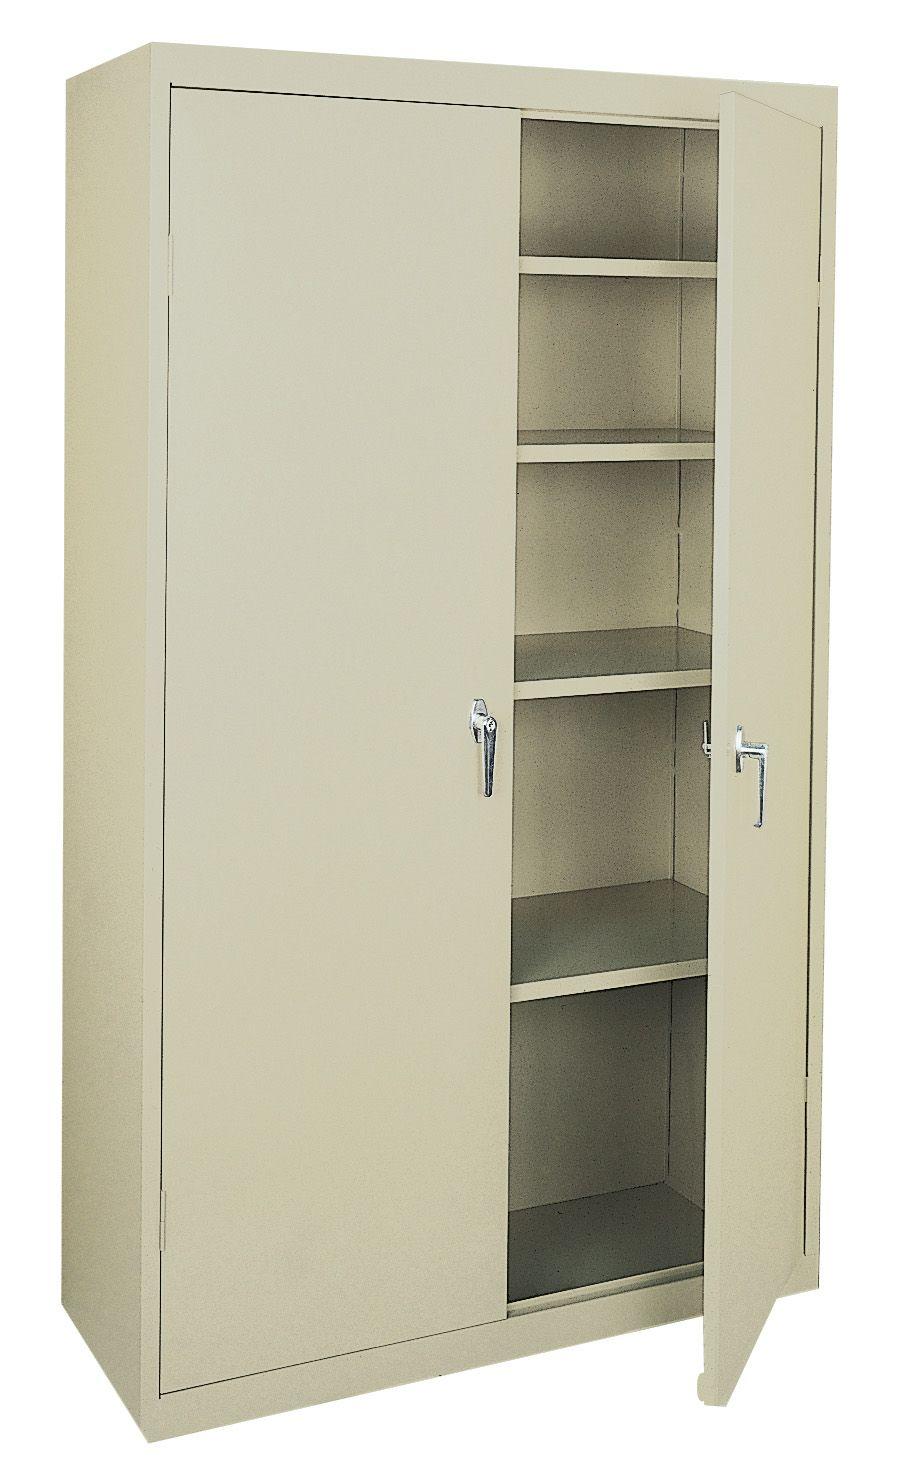 Best Storage Cabinets Google Search Storage Cabinets Steel 400 x 300